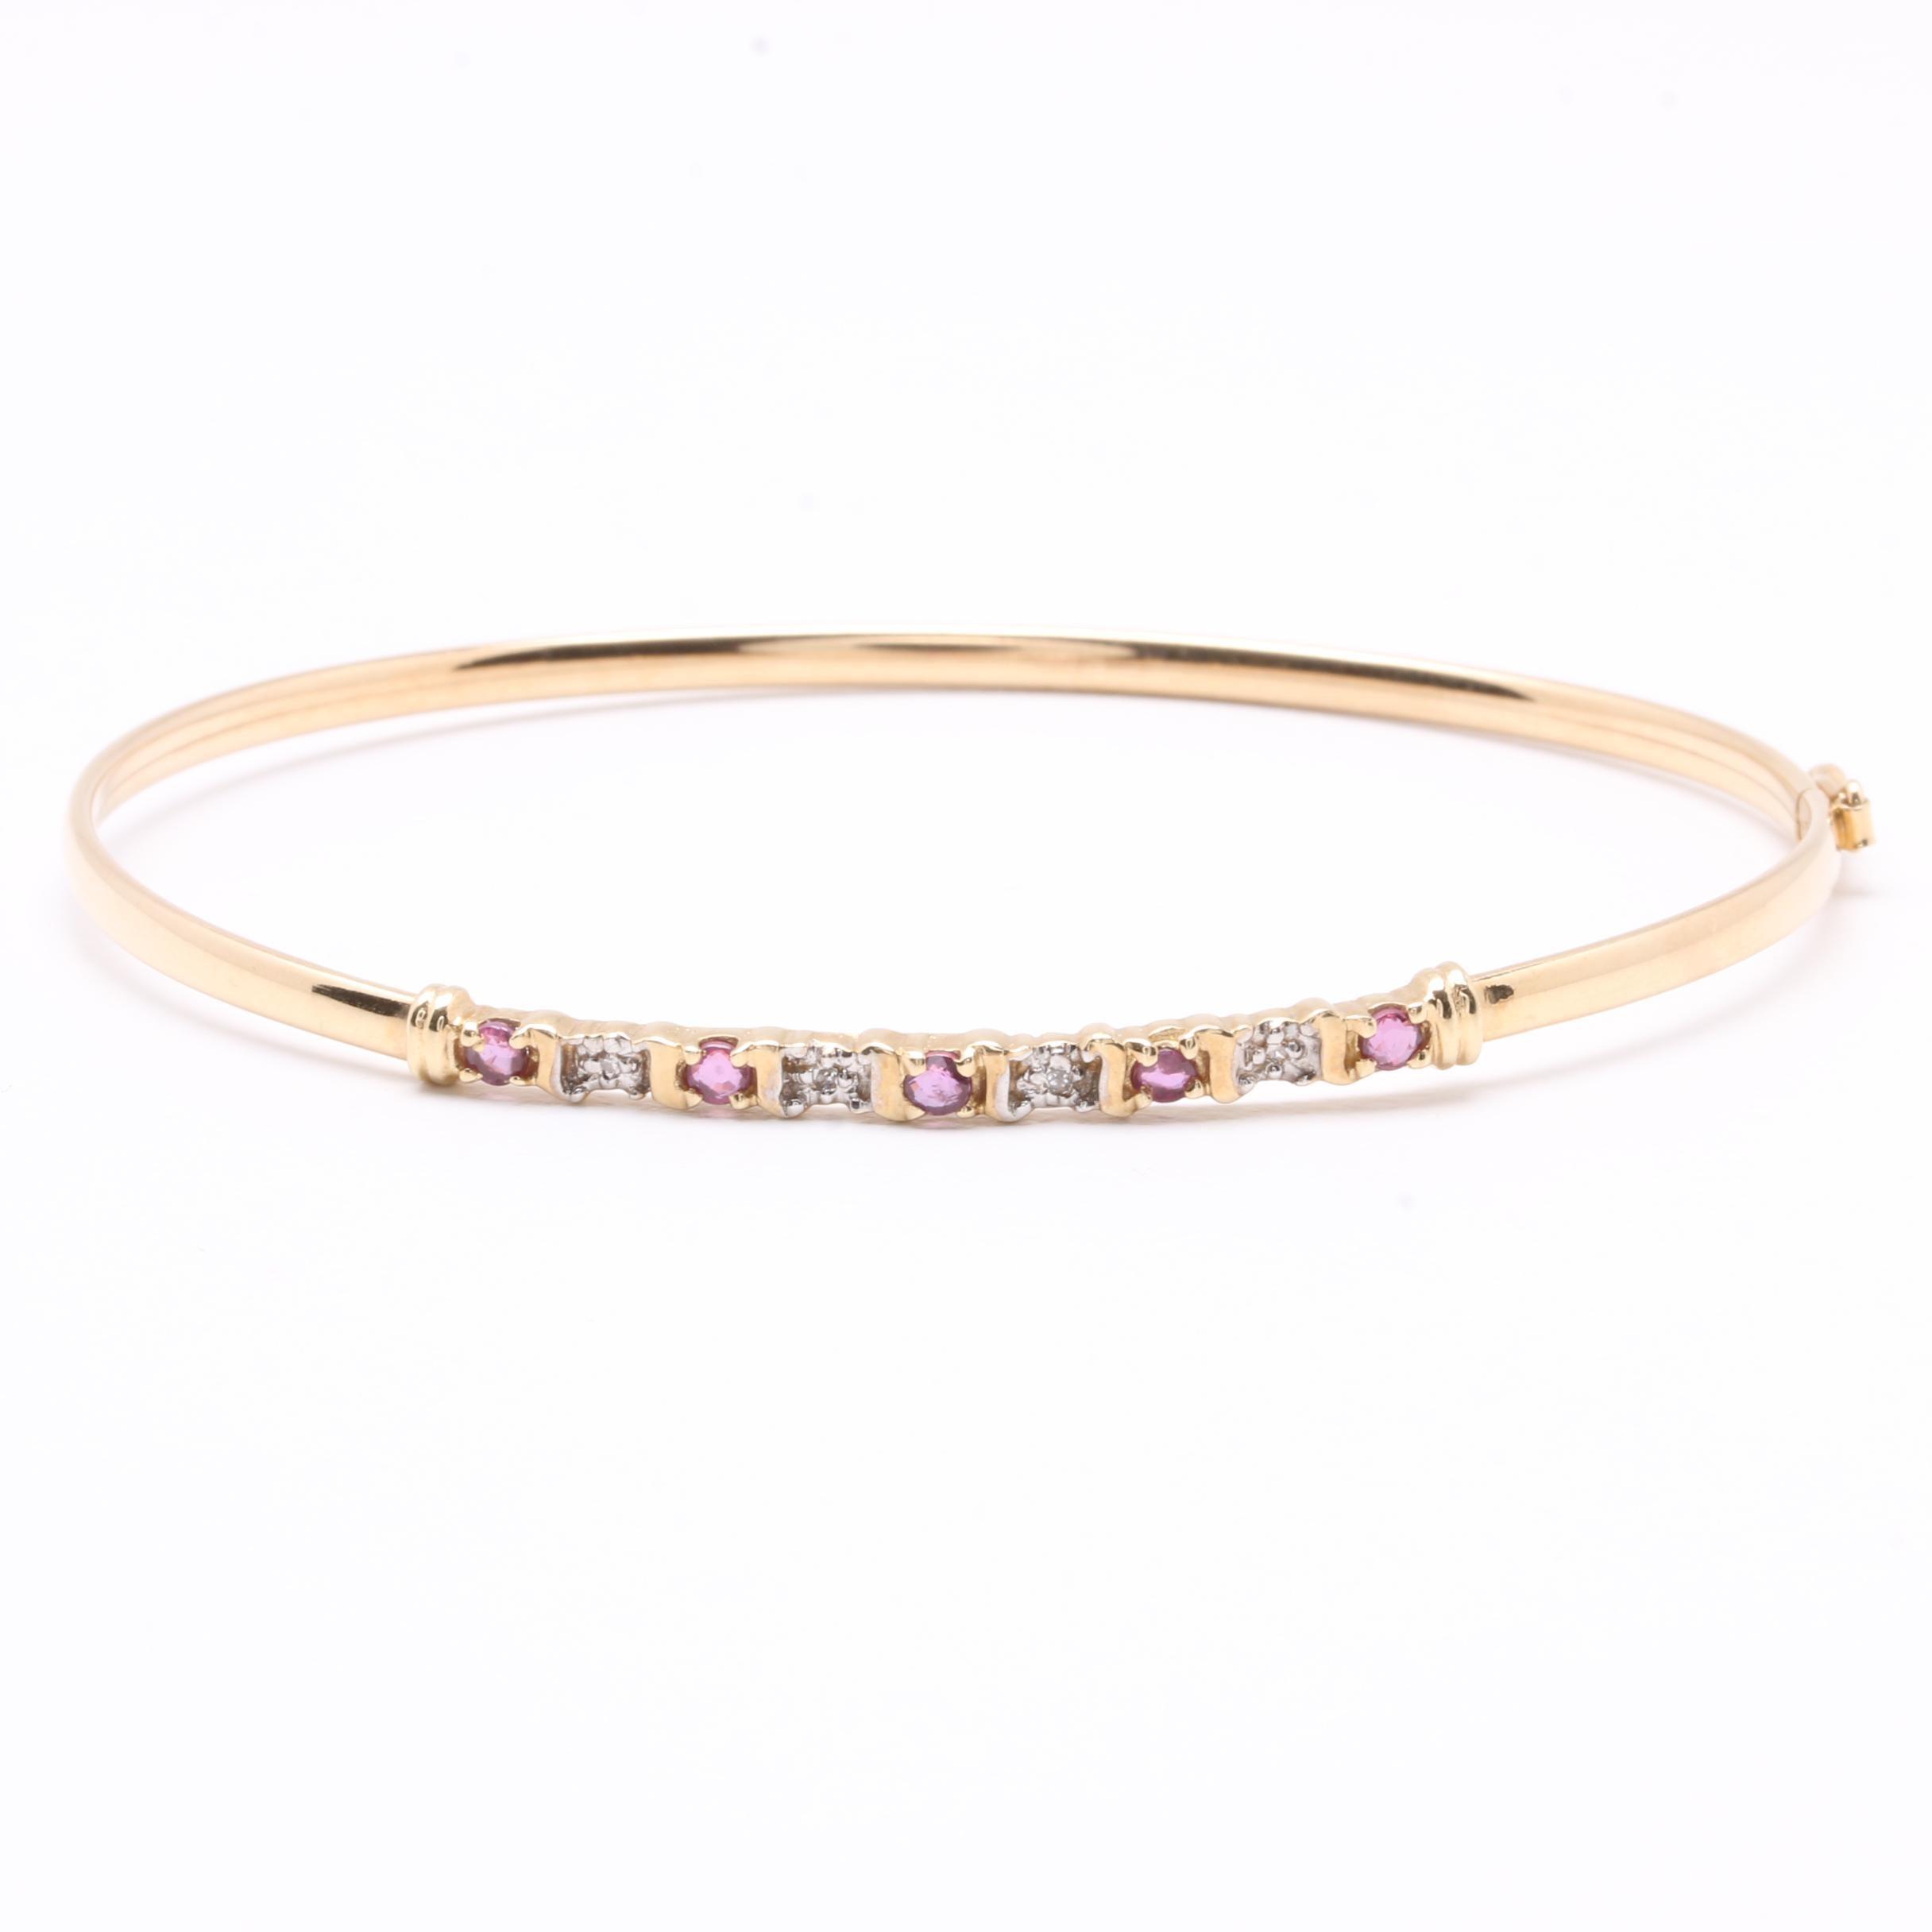 10K Yellow Gold Ruby and Diamond Hinged Bangle Bracelet